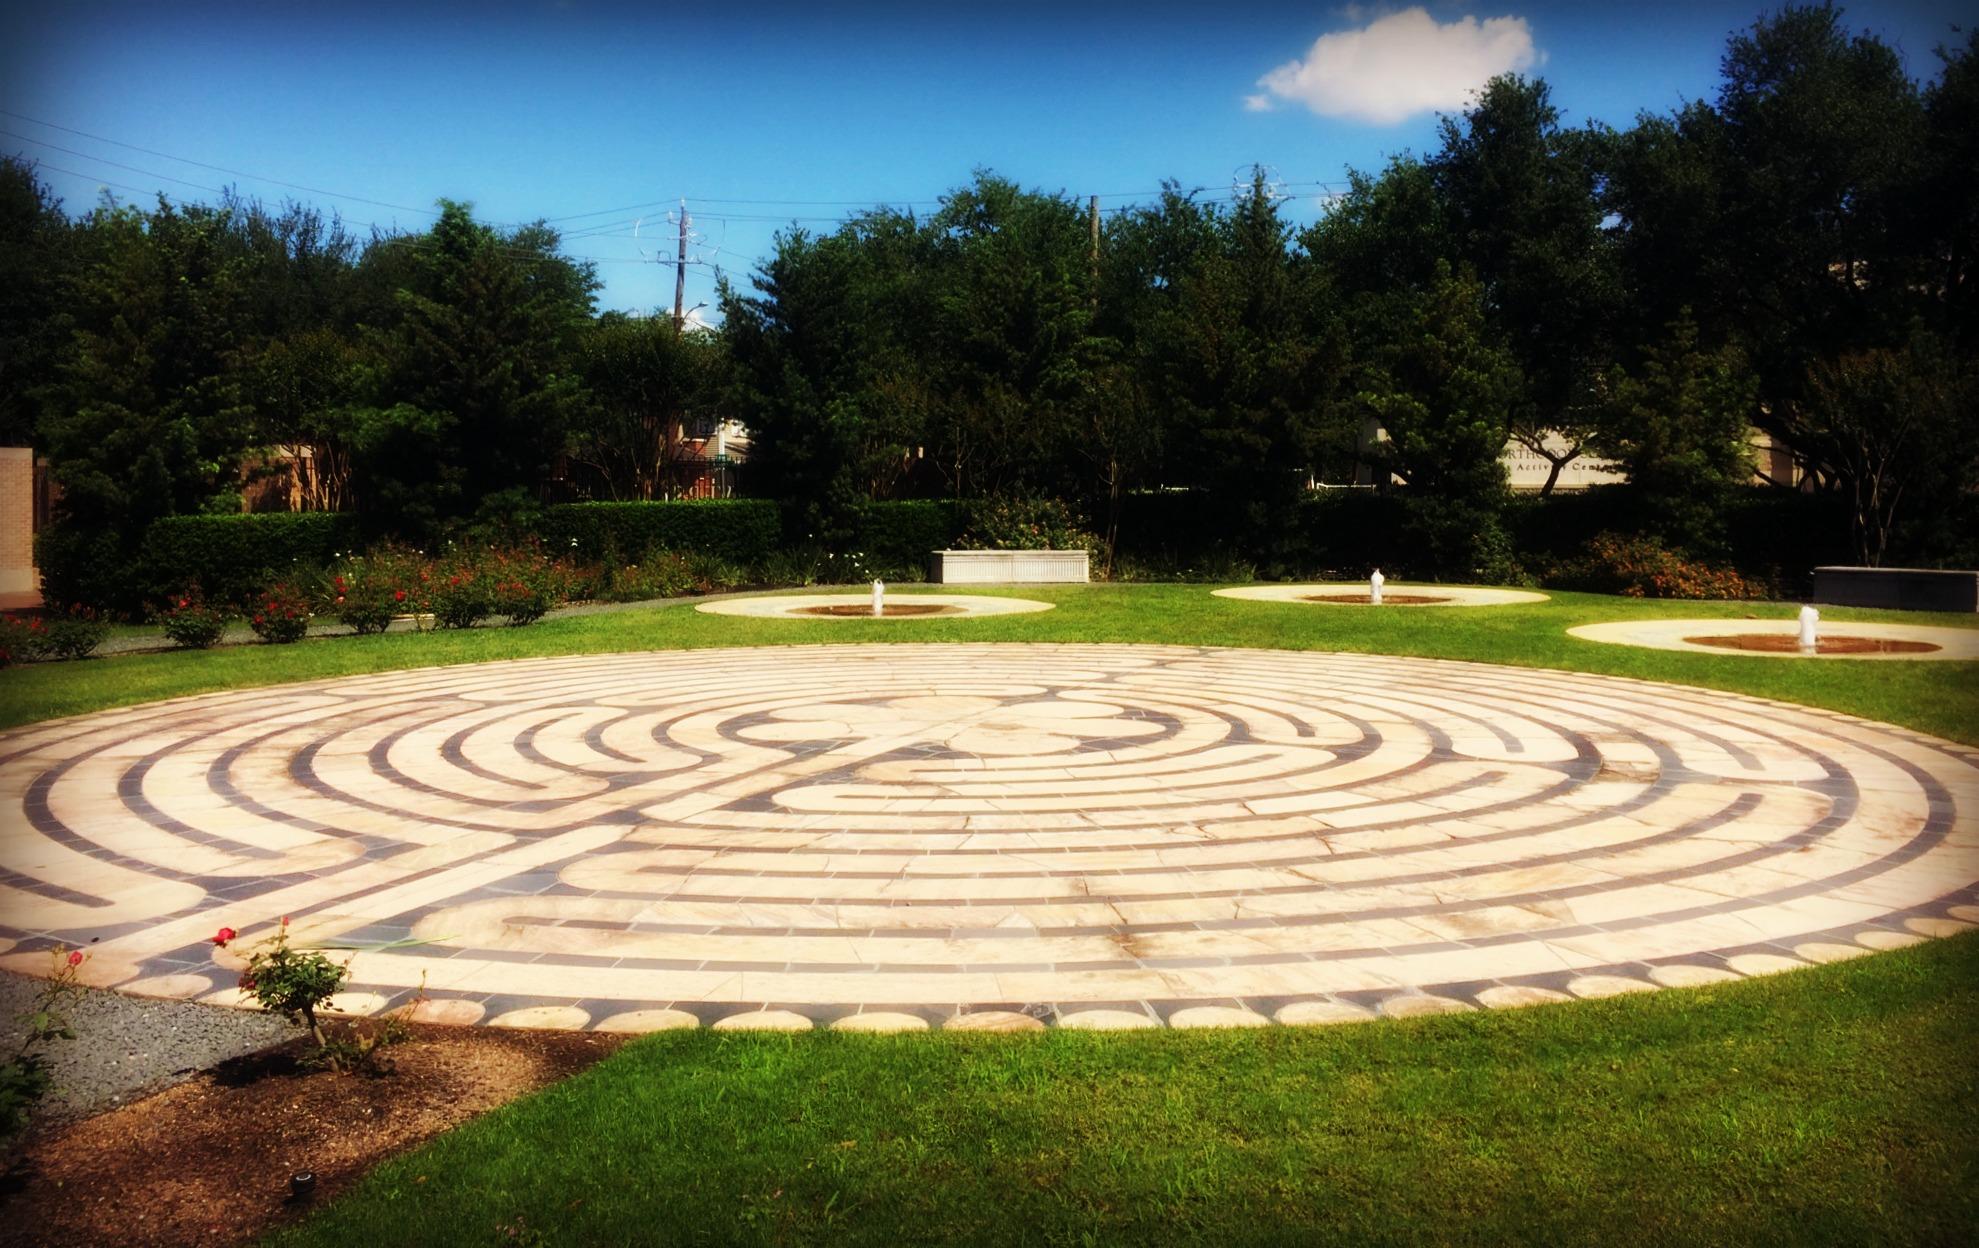 St. thomas labyrinth